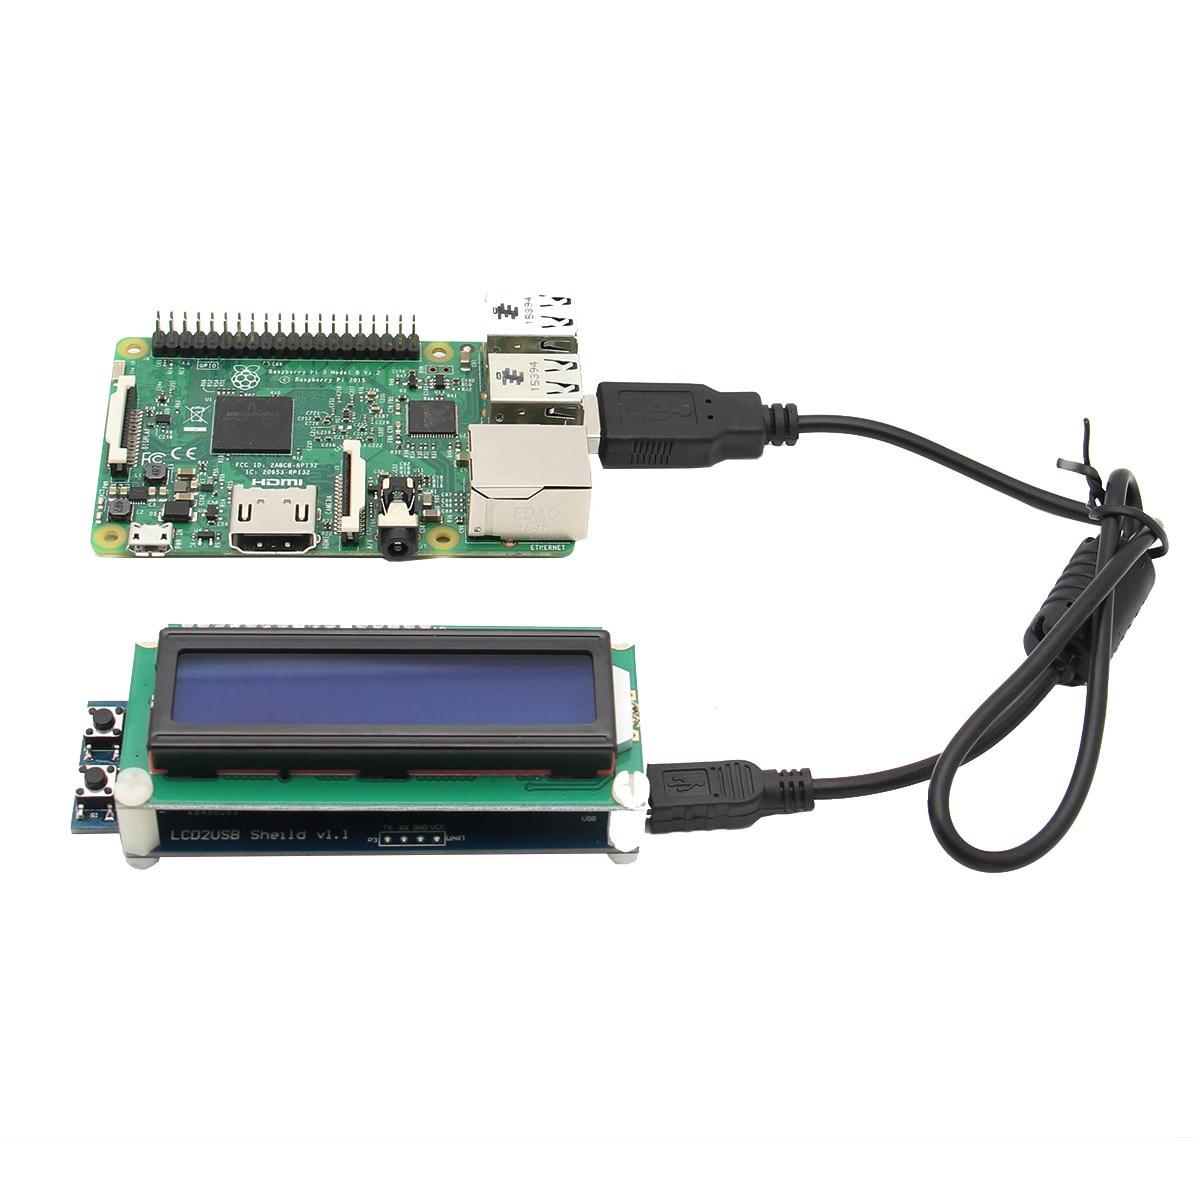 1602 RGB LCD Display Screen With USB Port For Raspberry Pi 3B 2B B+ Windows Linux